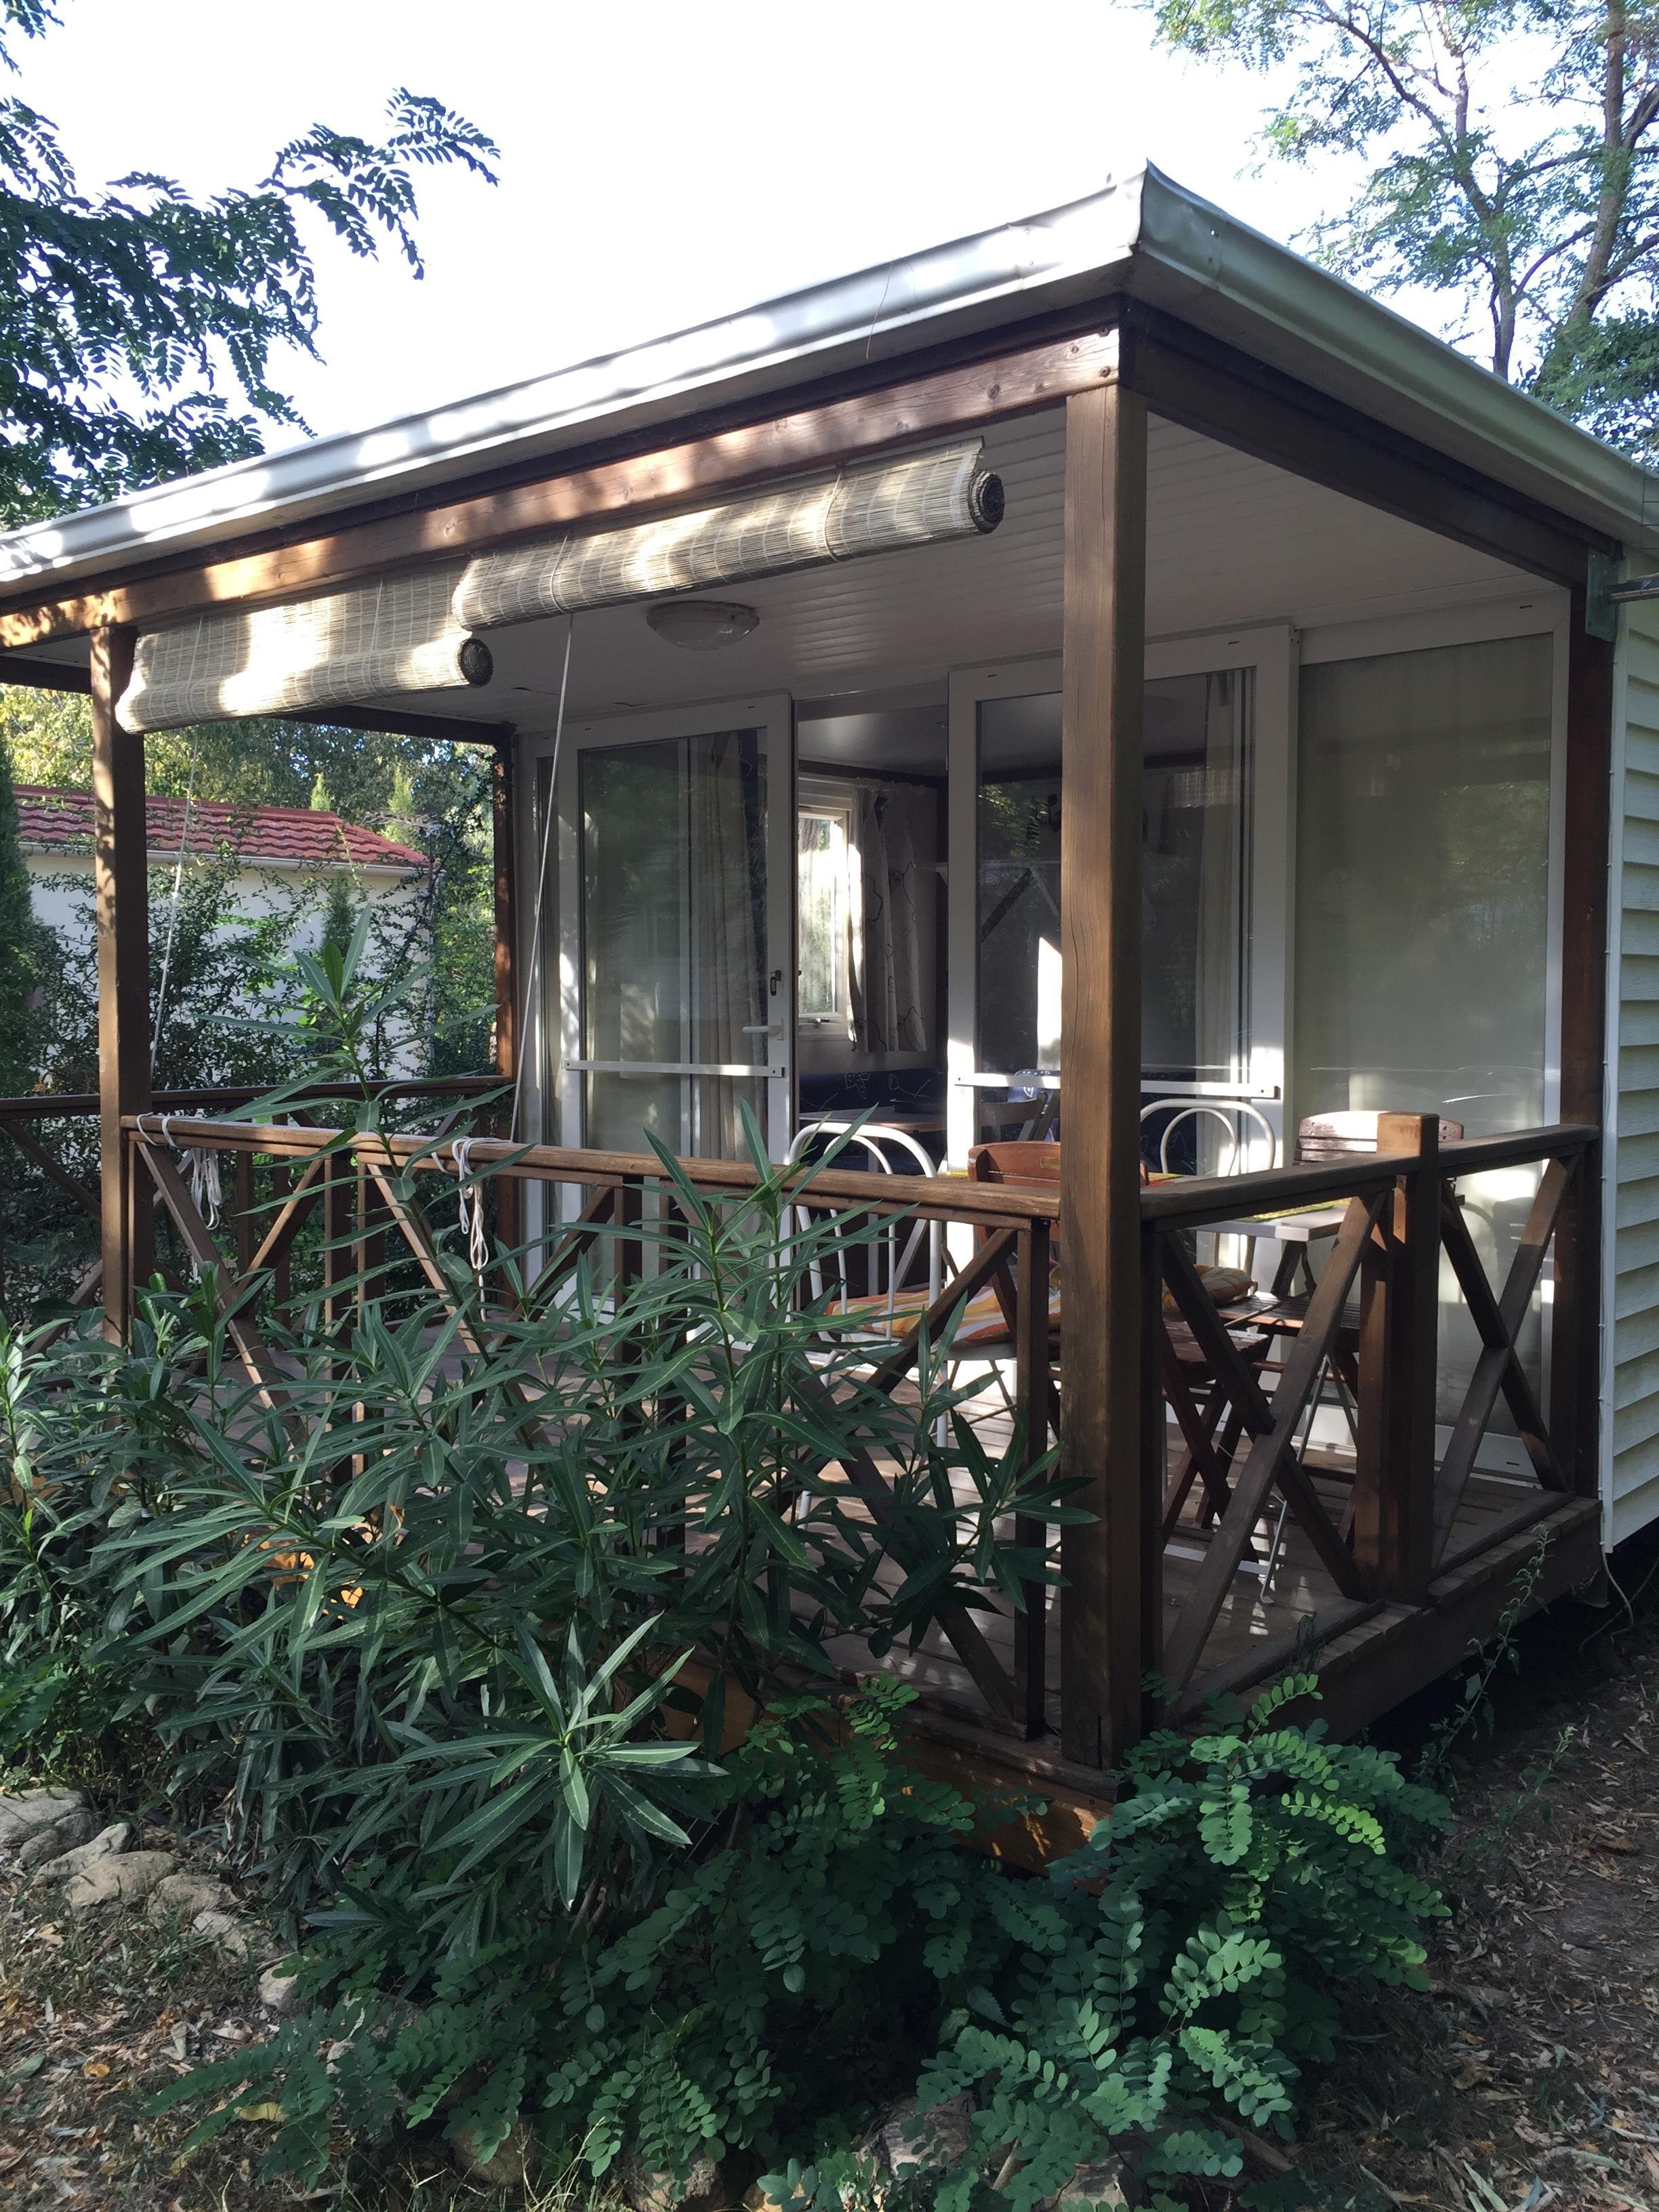 Mobil-home les Acacias 28 m² - 2 chambres - terrasse 8 m²